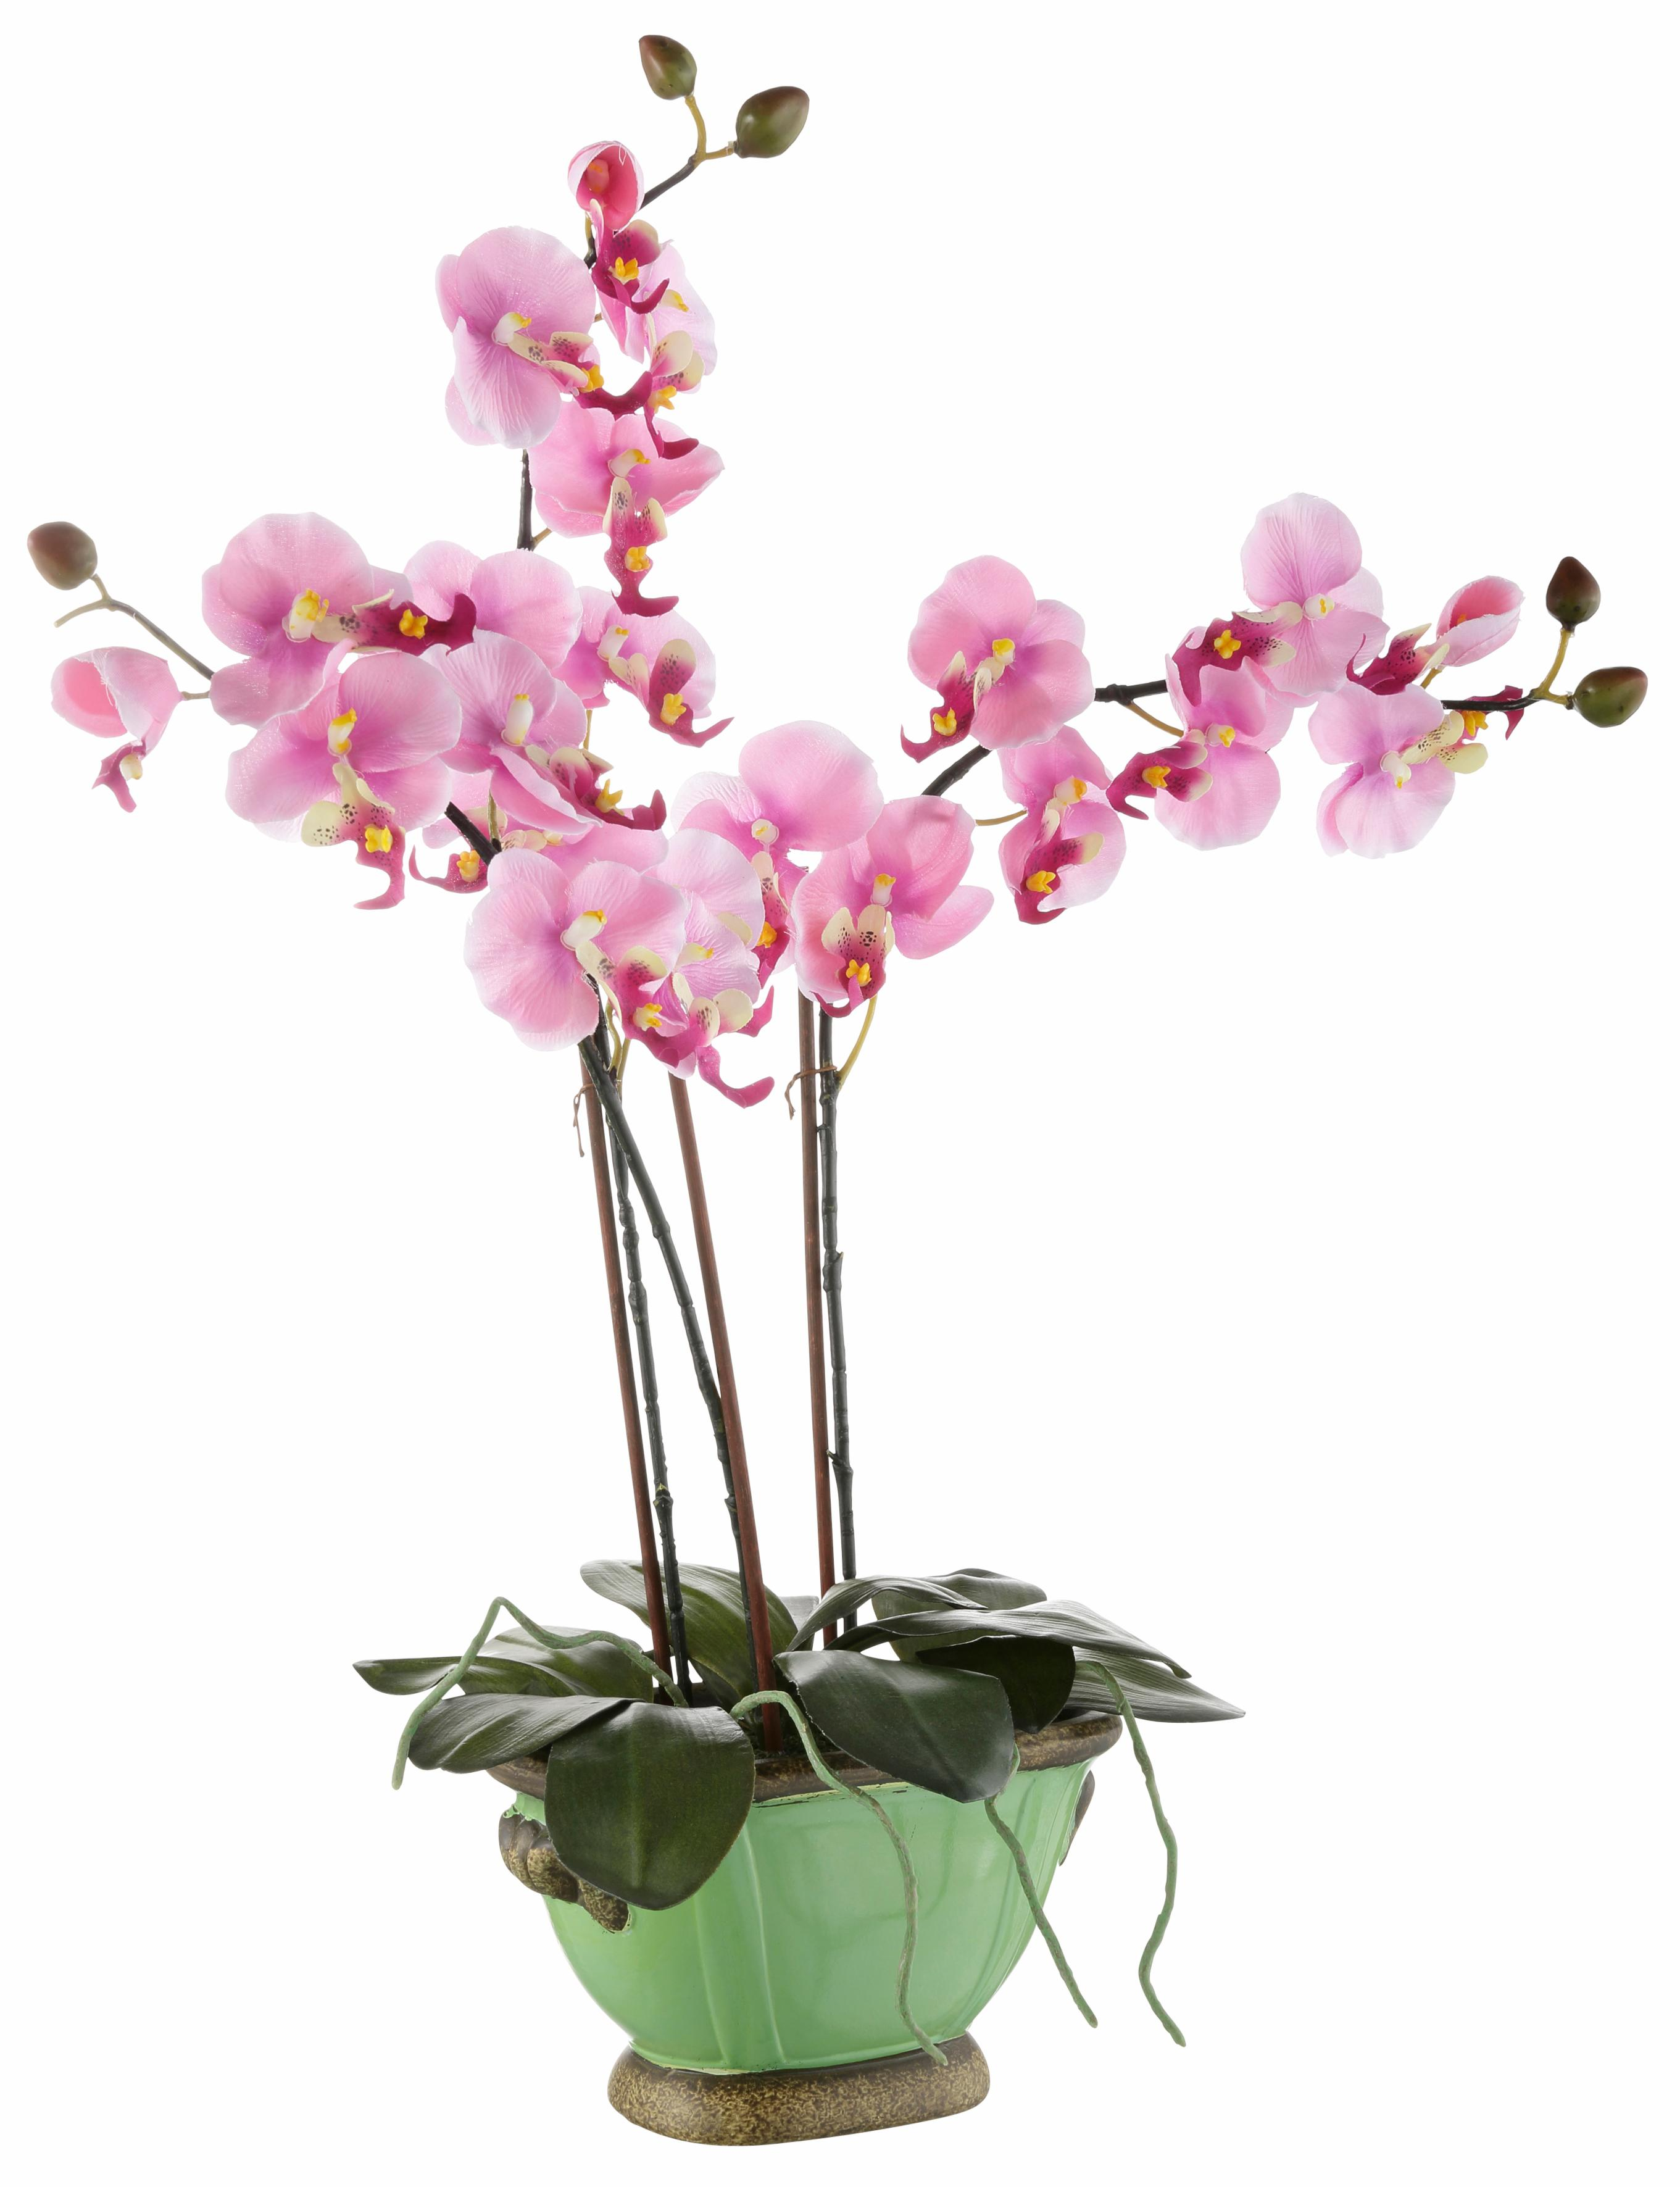 Home affaire Kunstpflanze »Orchidee« (1 Stück) | Dekoration > Dekopflanzen | home affaire